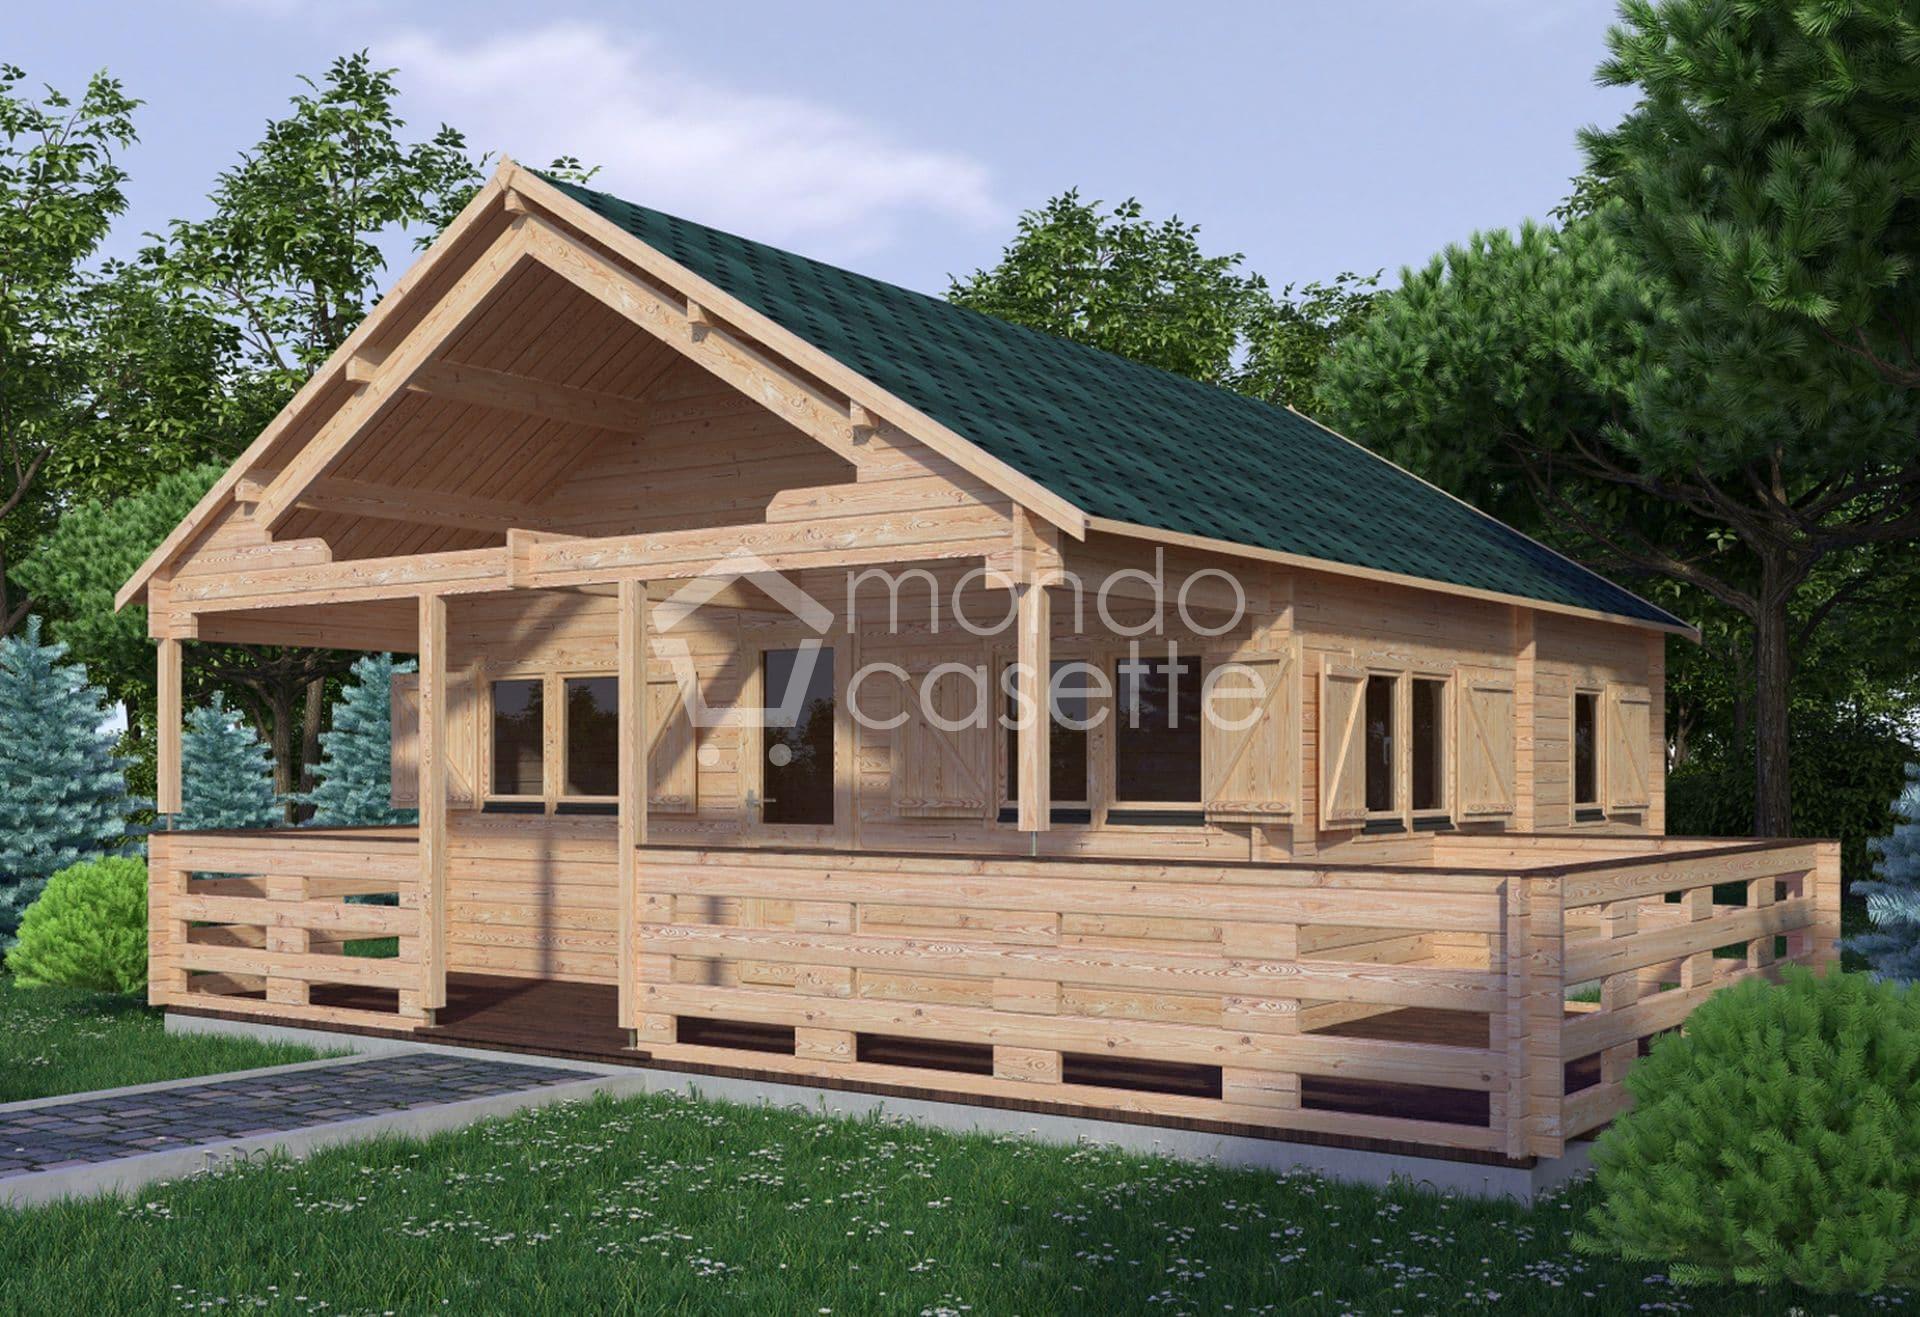 Casetta in legno mod. Asva - 6x6 - pareti da 45 mm